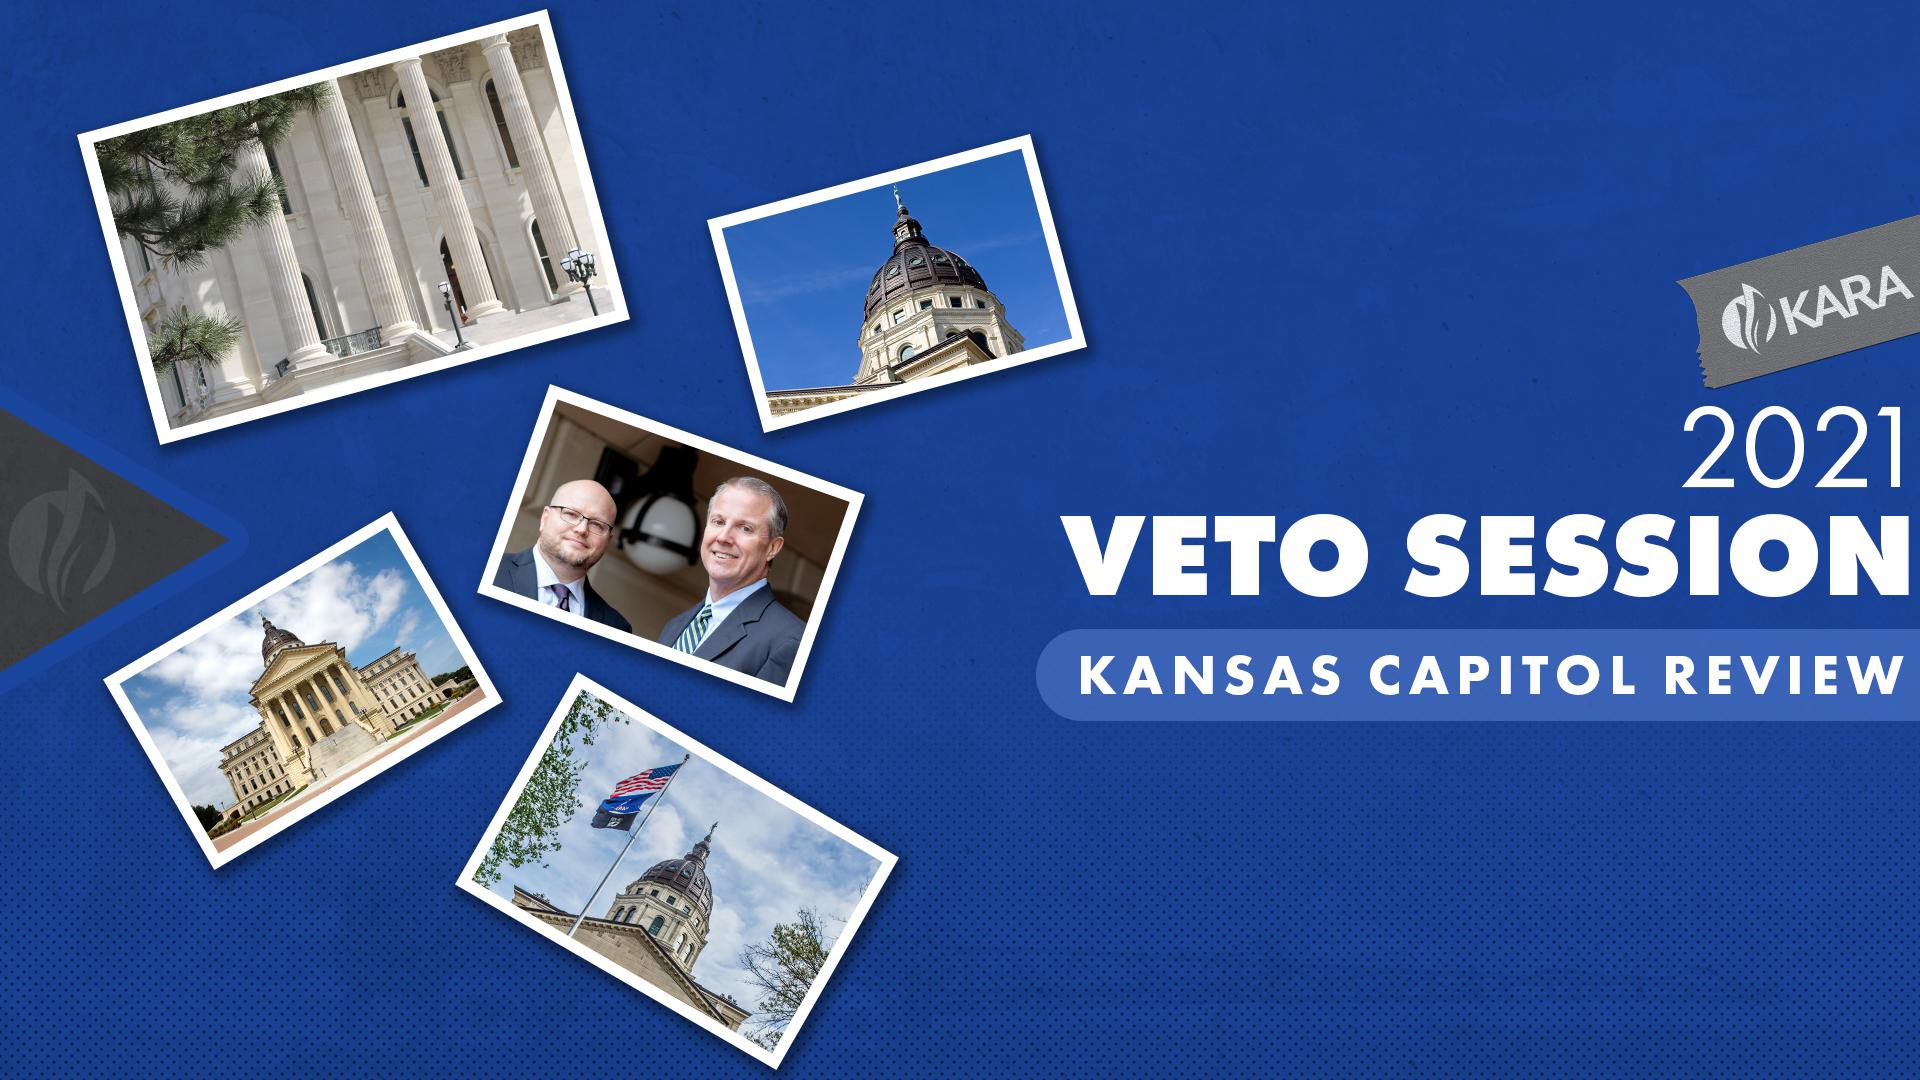 2021 Kansas Capitol Review Veto Session